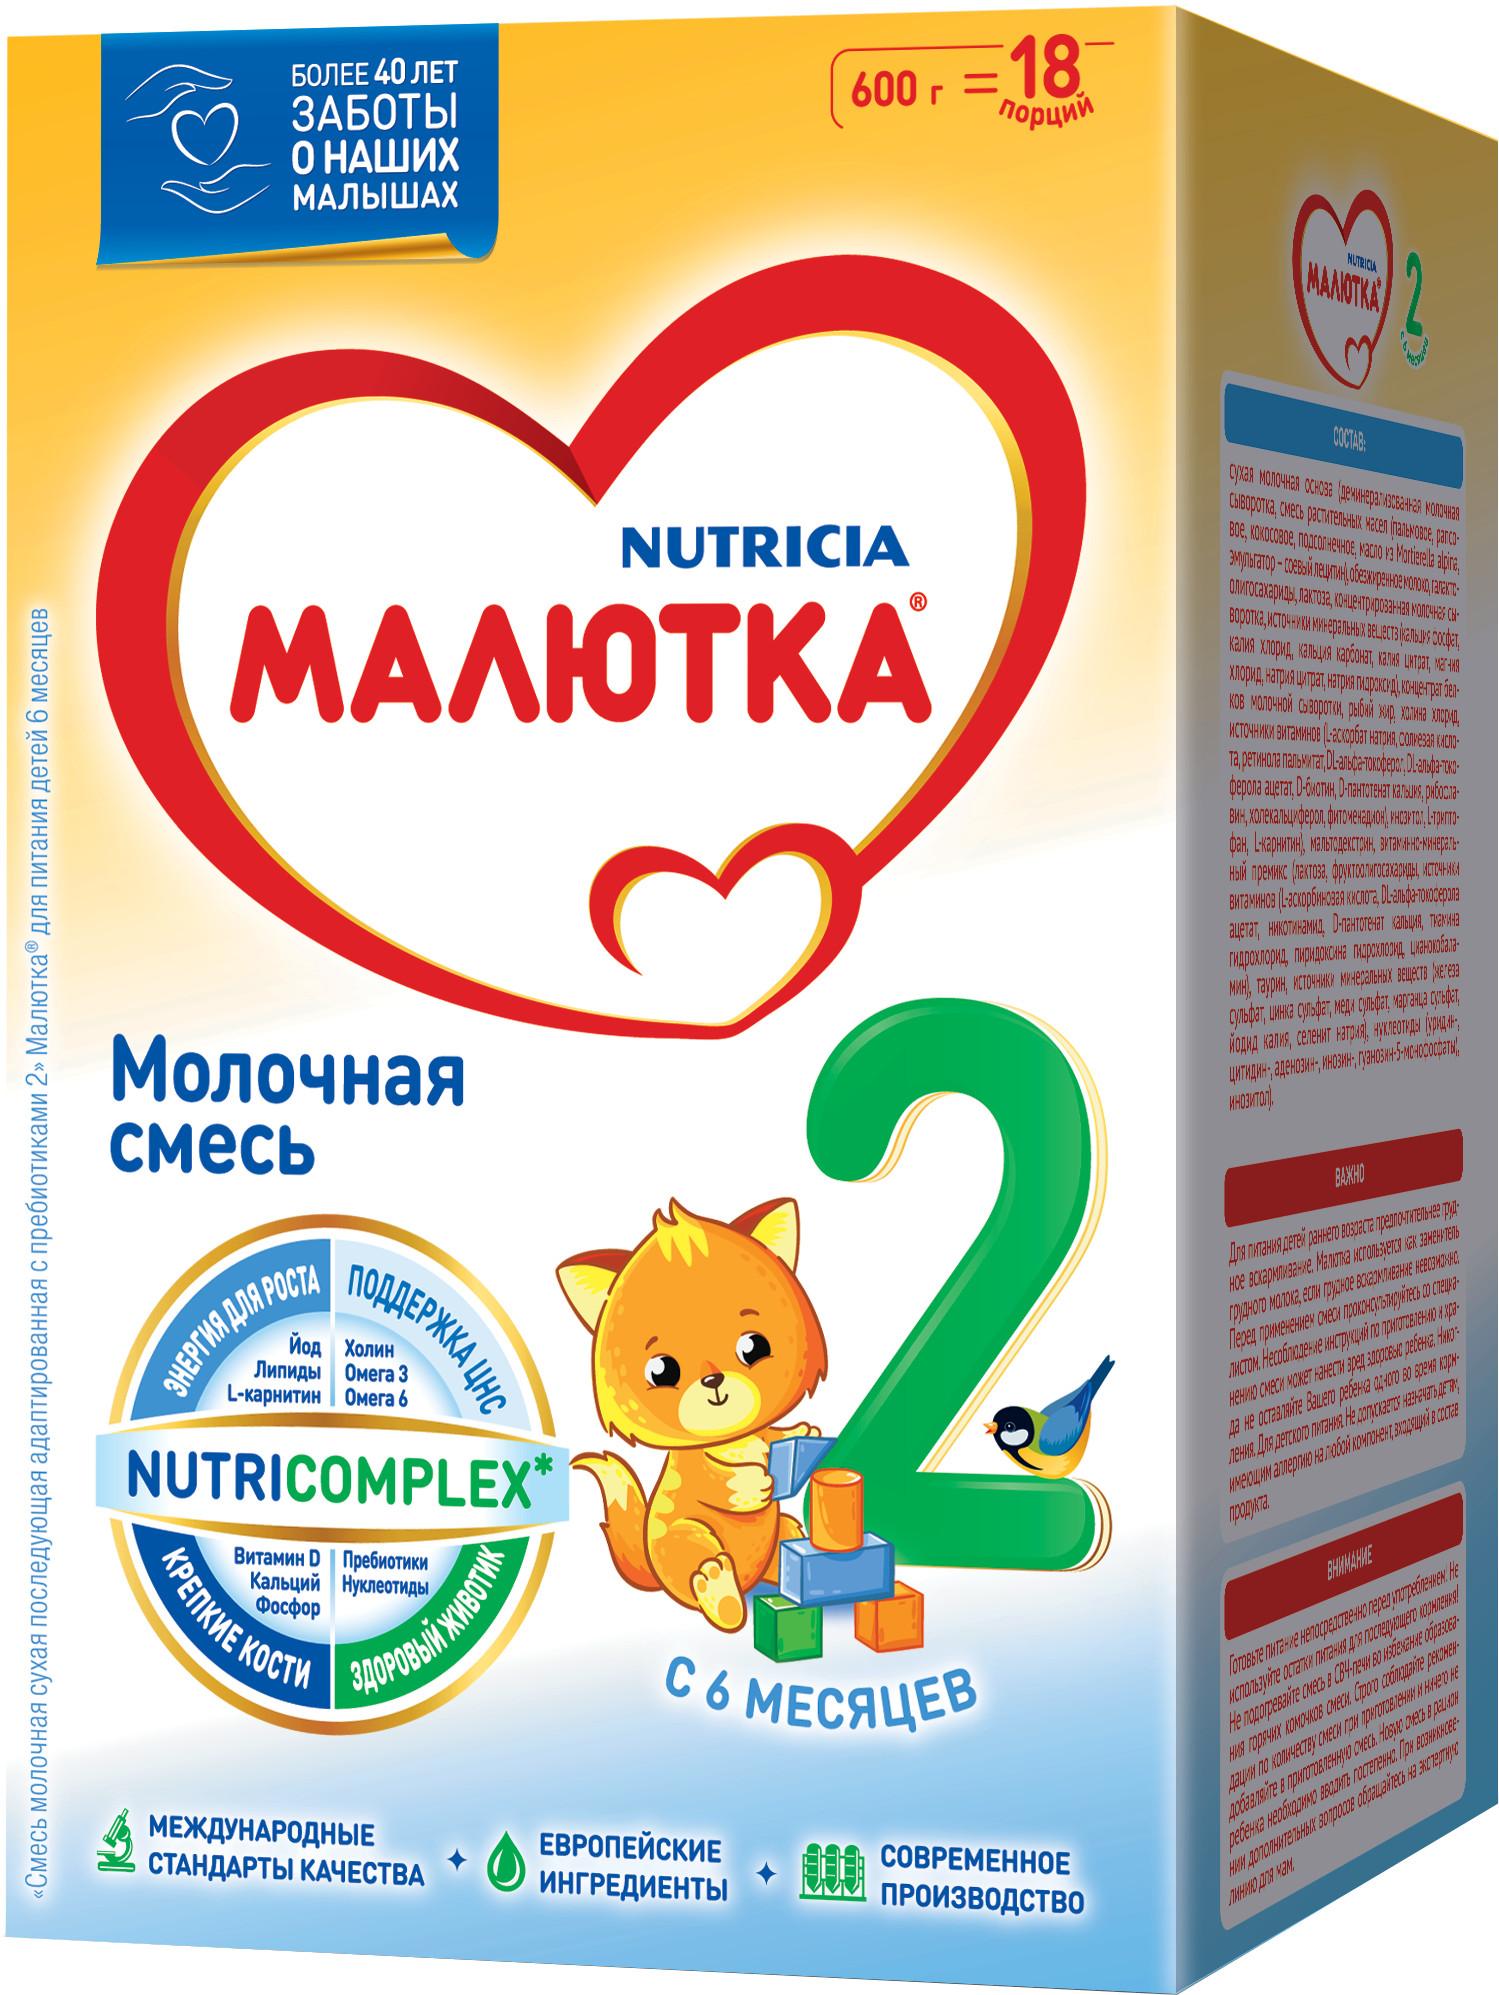 Молочная смесь Nutricia Малютка (Nutricia) 2 (с 6 месяцев) 600 г